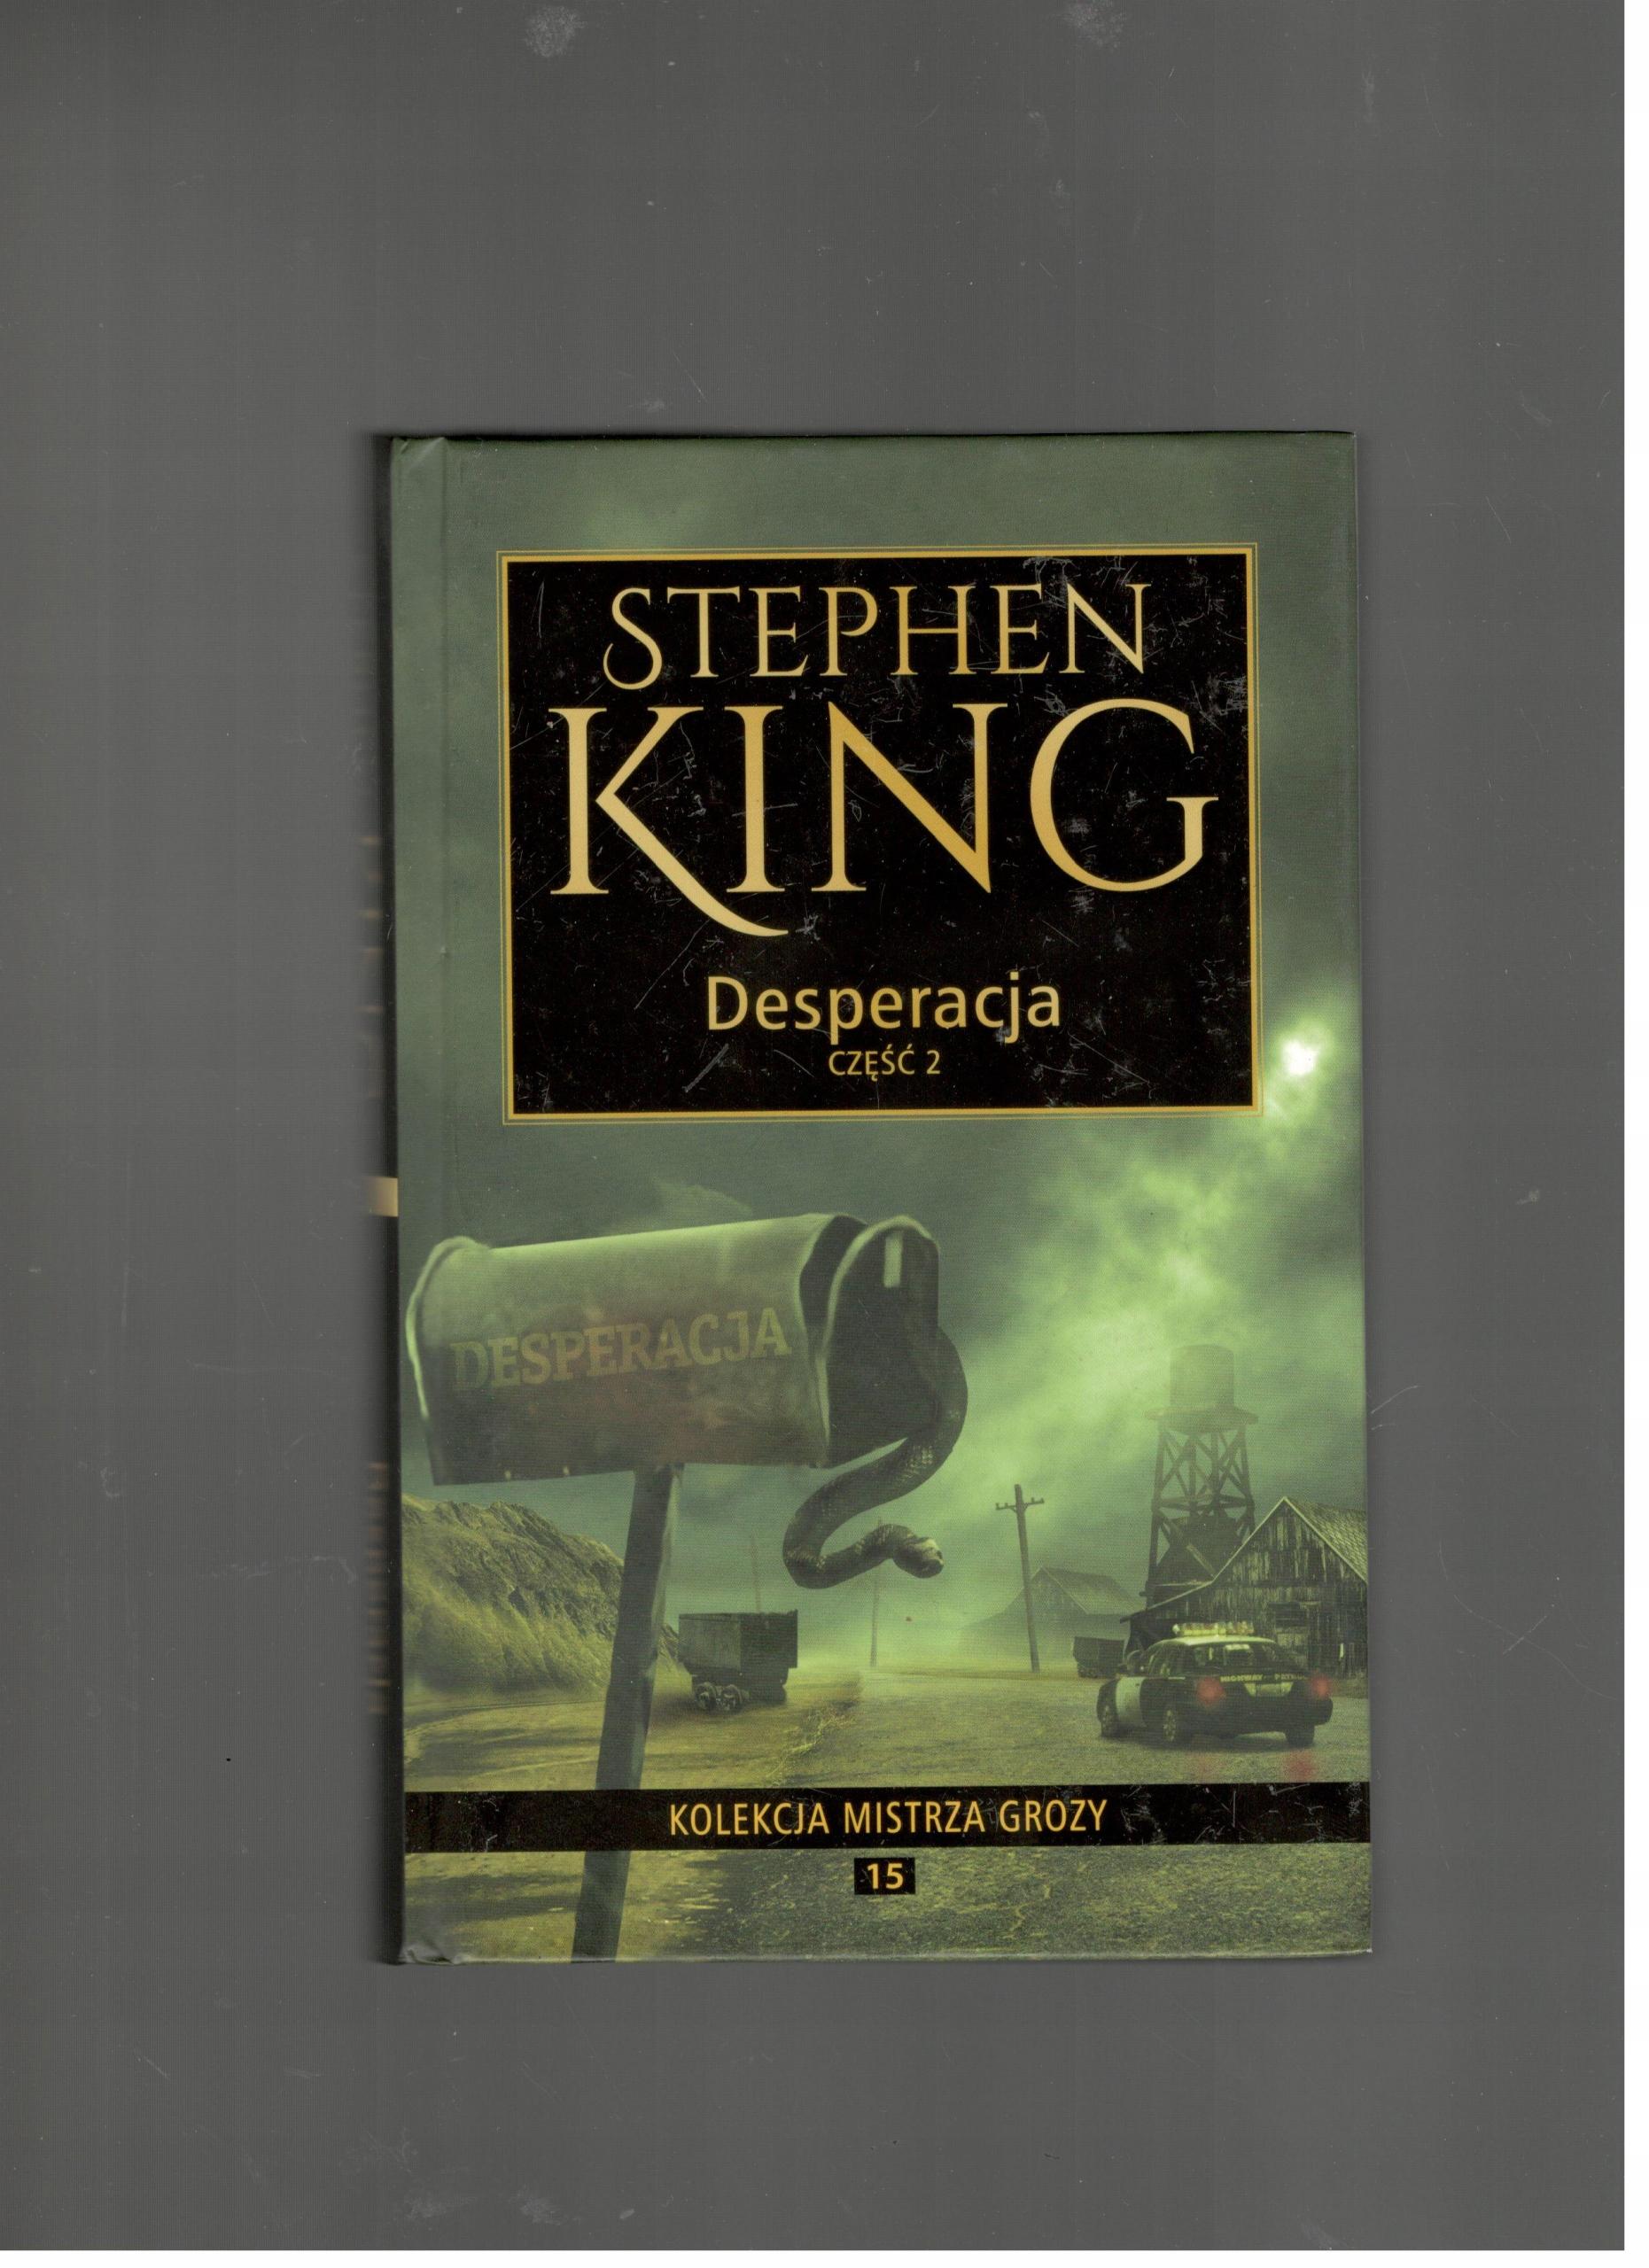 DESPERACJA - CZĘŚĆ 2 STEPHEN KING